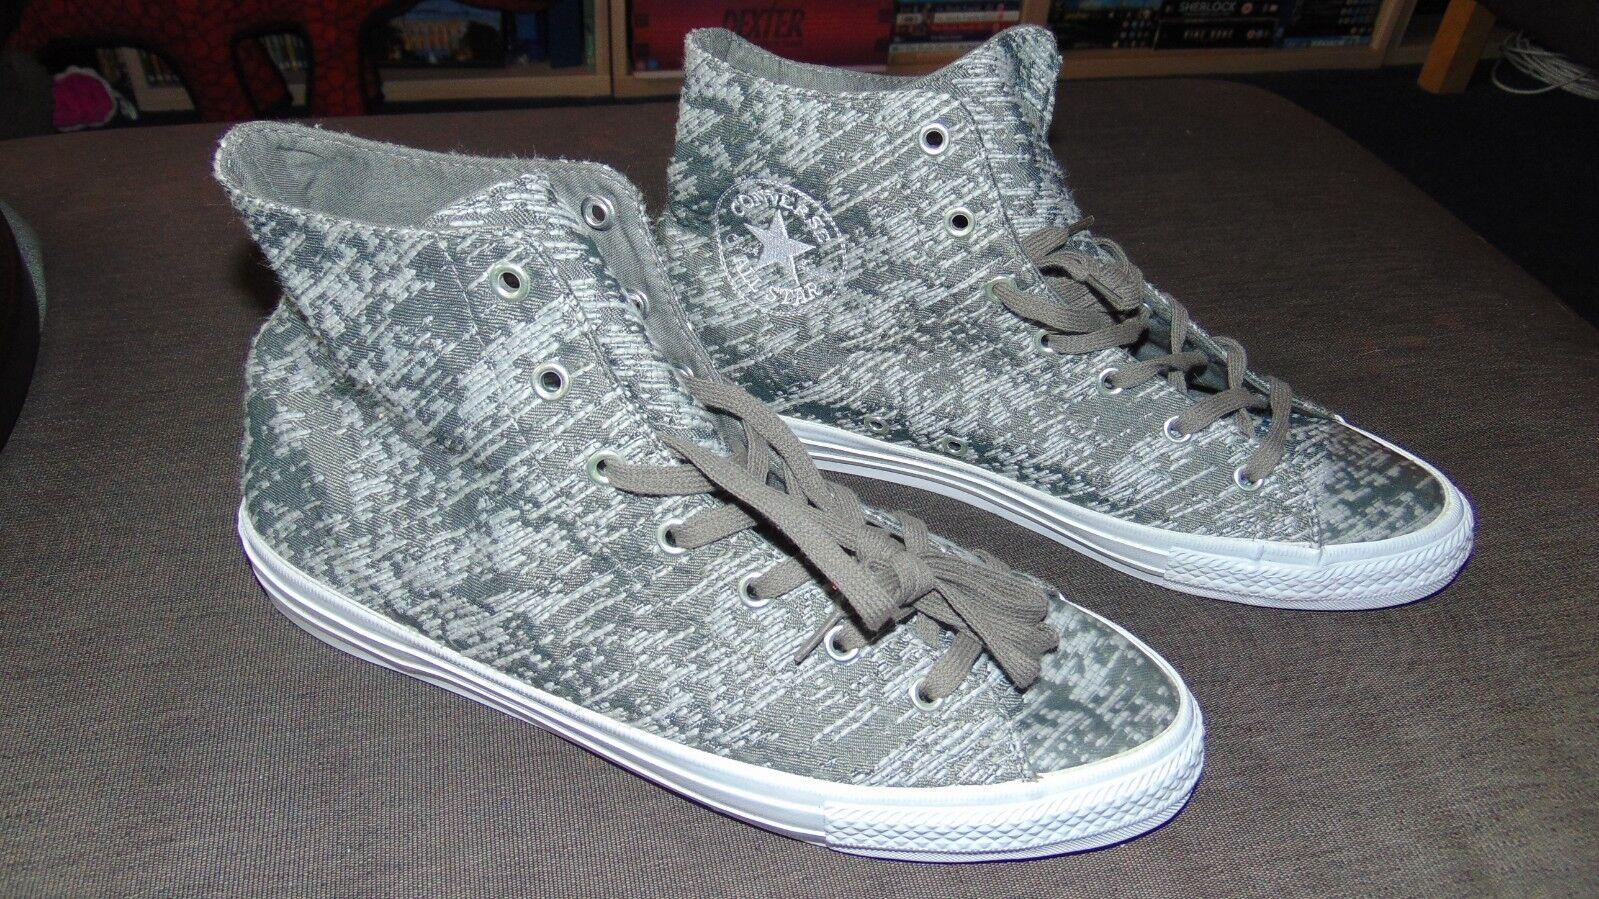 Converse CT All Stars 'Gemma' High Top Trainers shoes UK7.5 EU42 Charcoal BNWoB